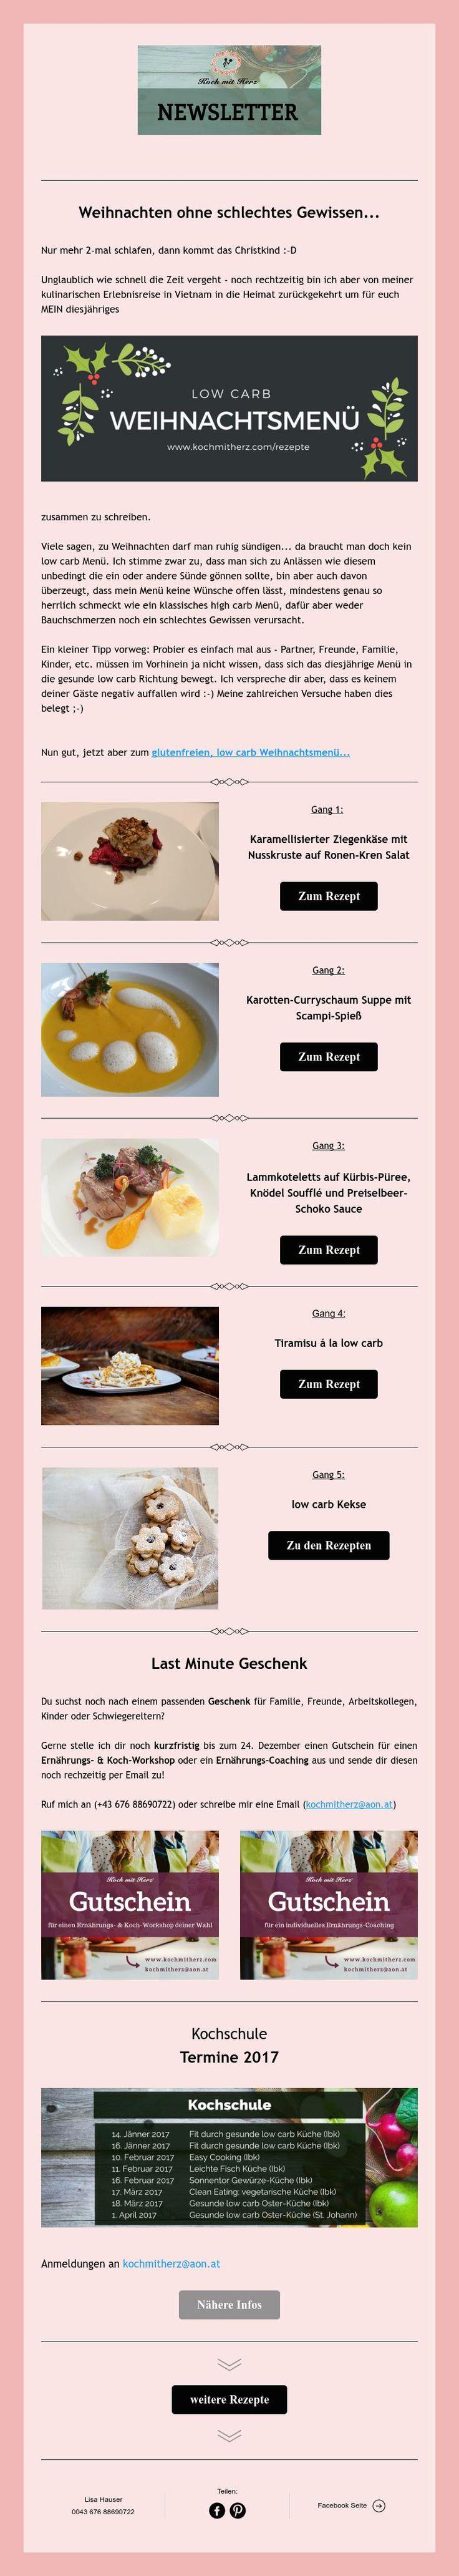 Martini Rezept • Essen gehen • Rabatt Aktion • Kochschule